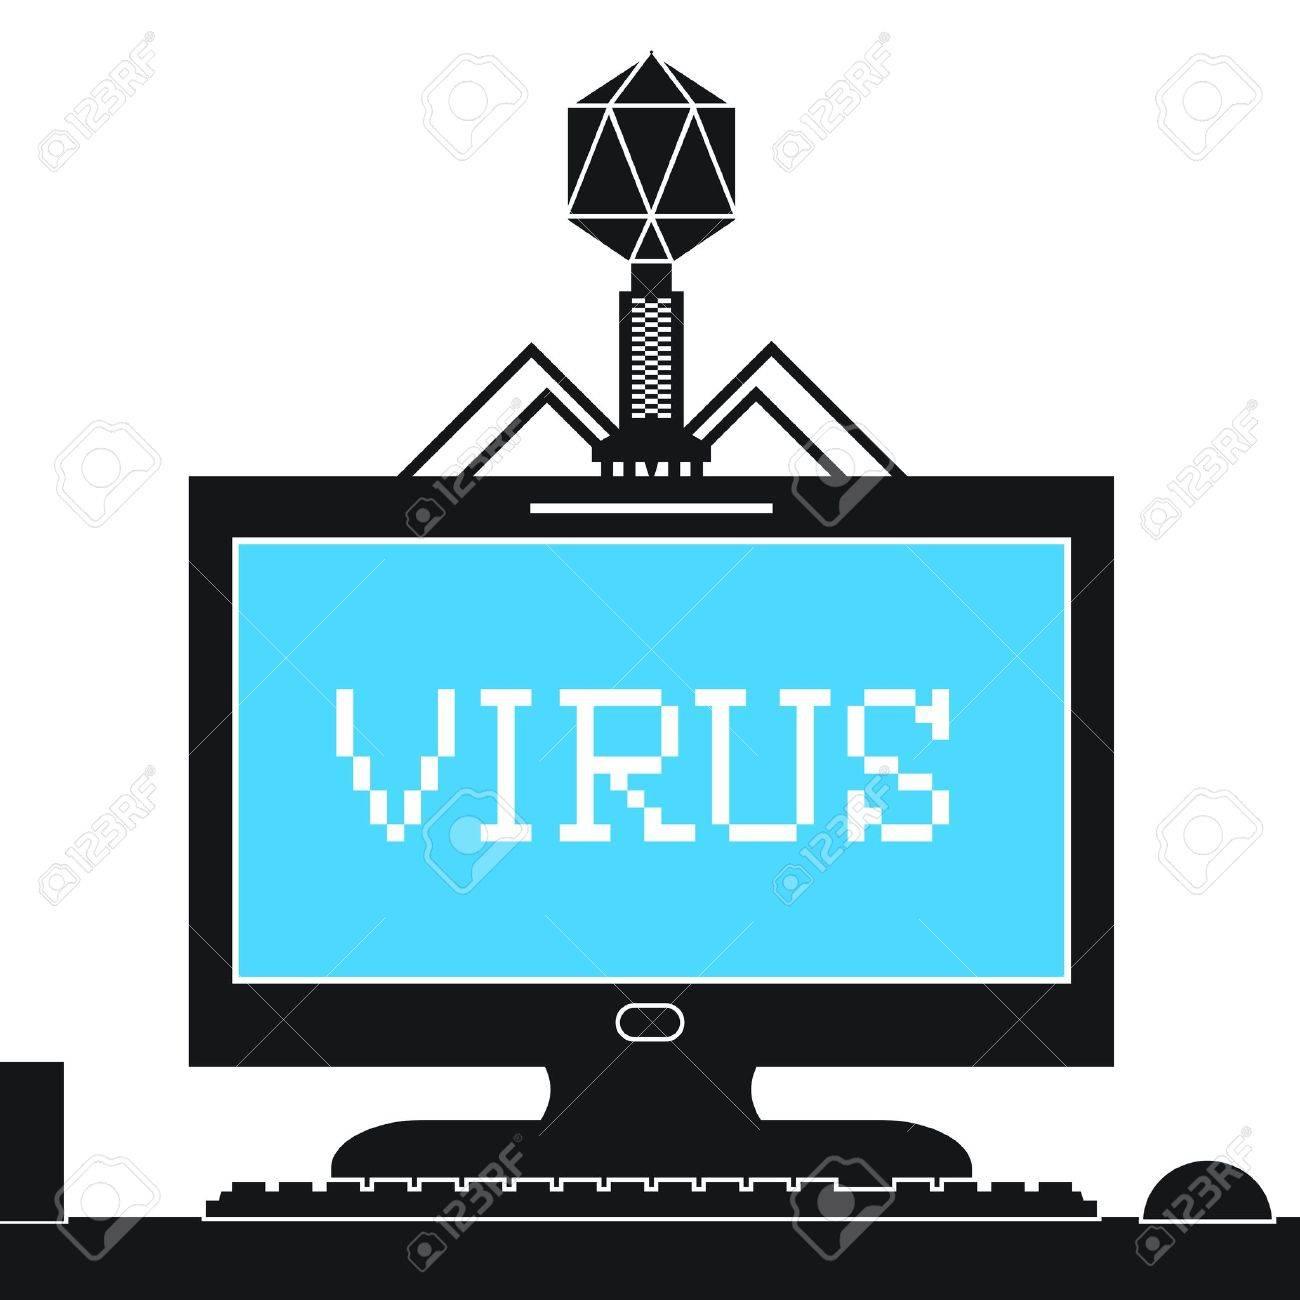 Computer virus clipart 2 » Clipart Station.